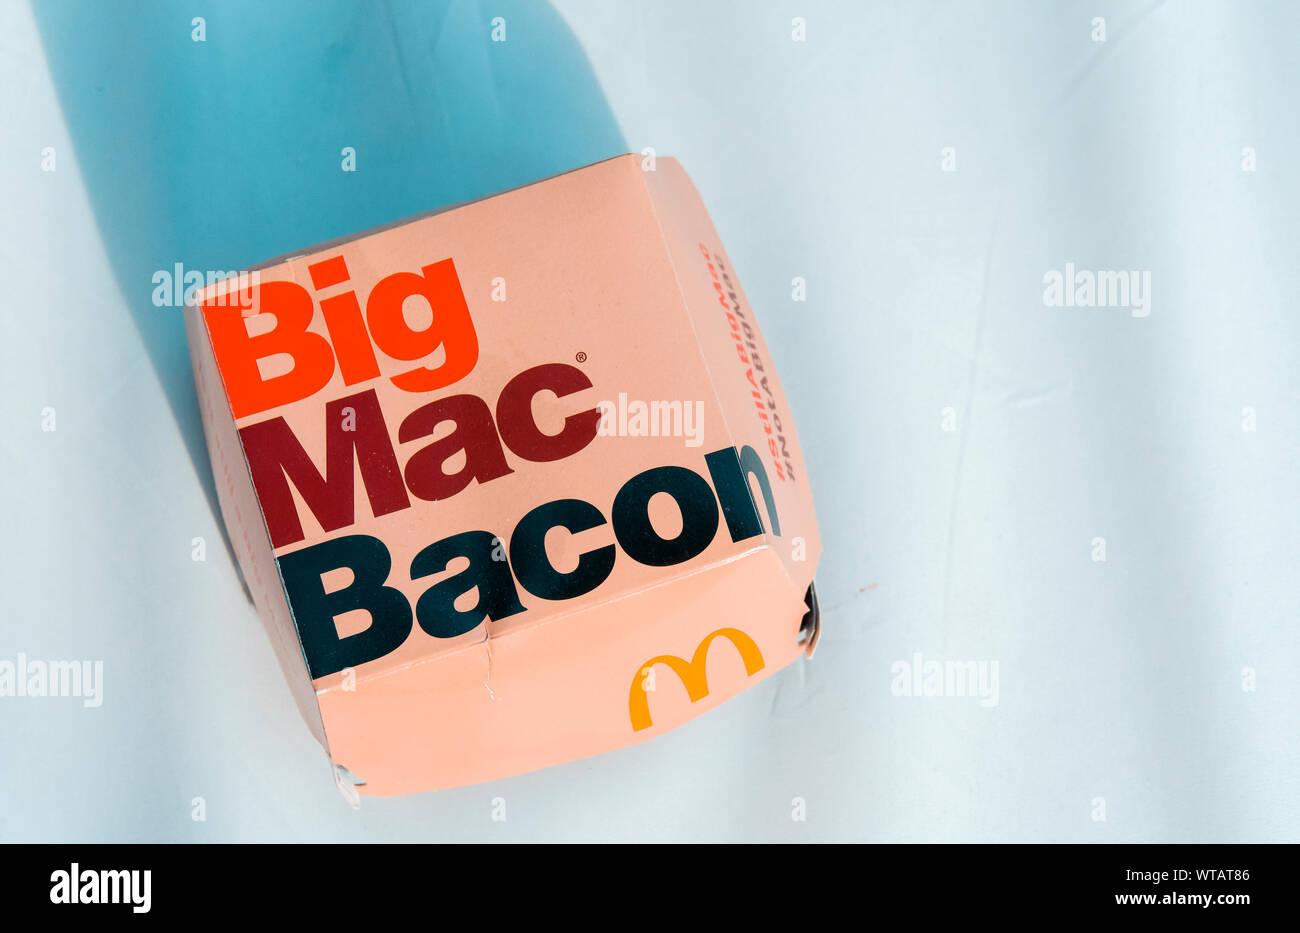 McDonald's Big Mac Bacon Burger, Mcdonald's is the worlds biggest chain of fast food restaurants Stock Photo